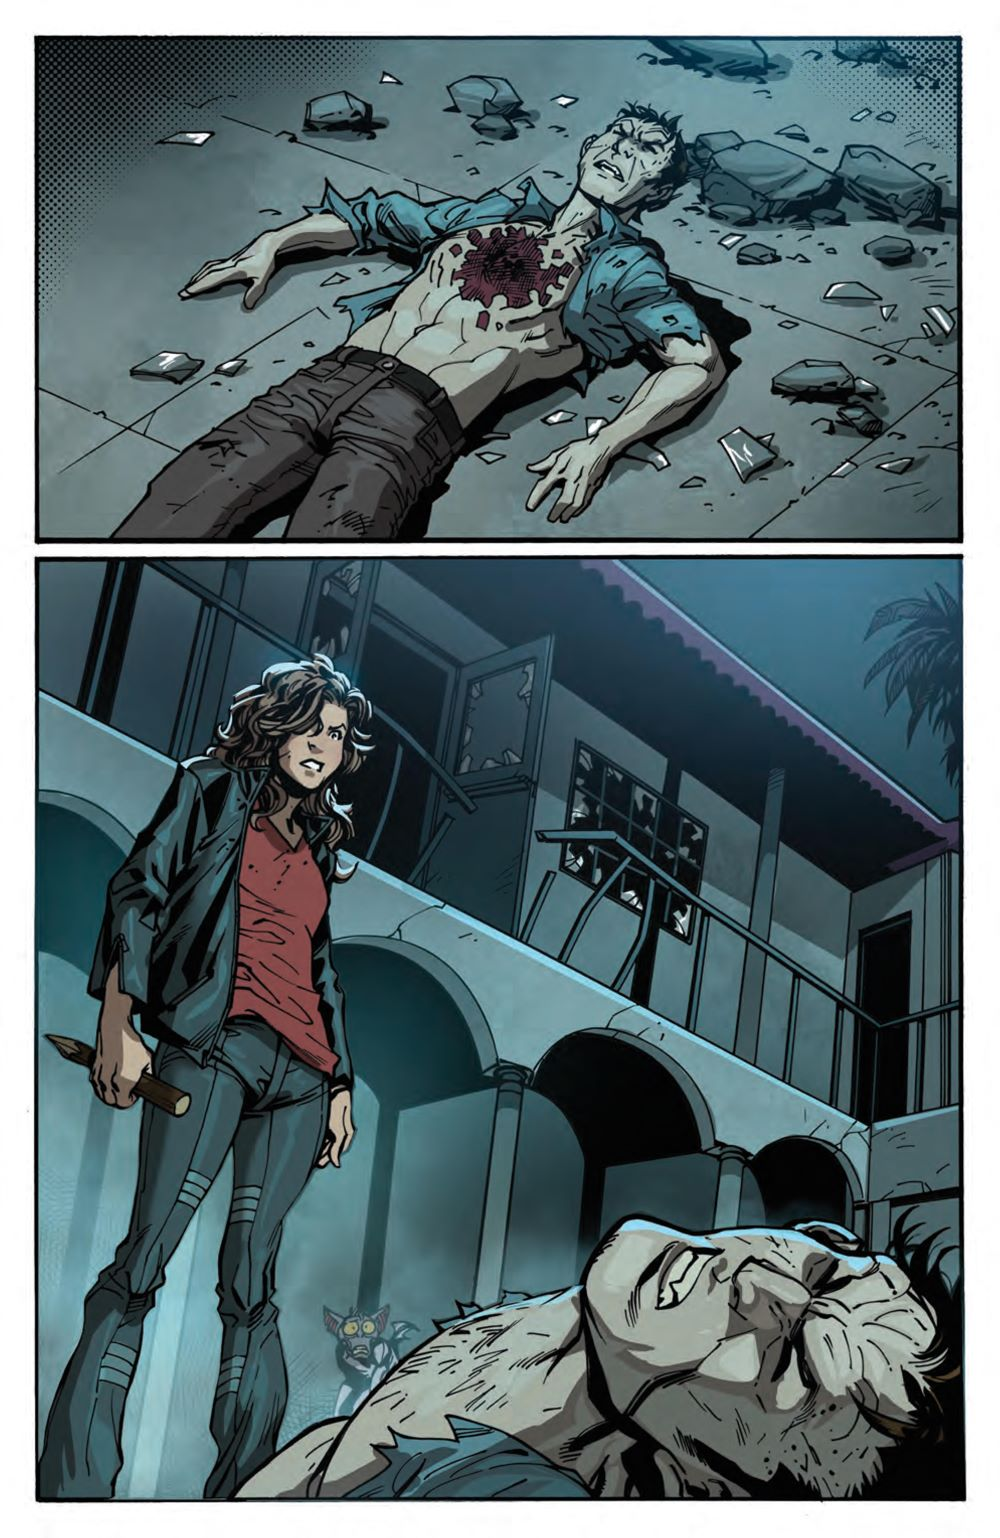 Buffy_024_PRESS_6 ComicList Previews: BUFFY THE VAMPIRE SLAYER #24